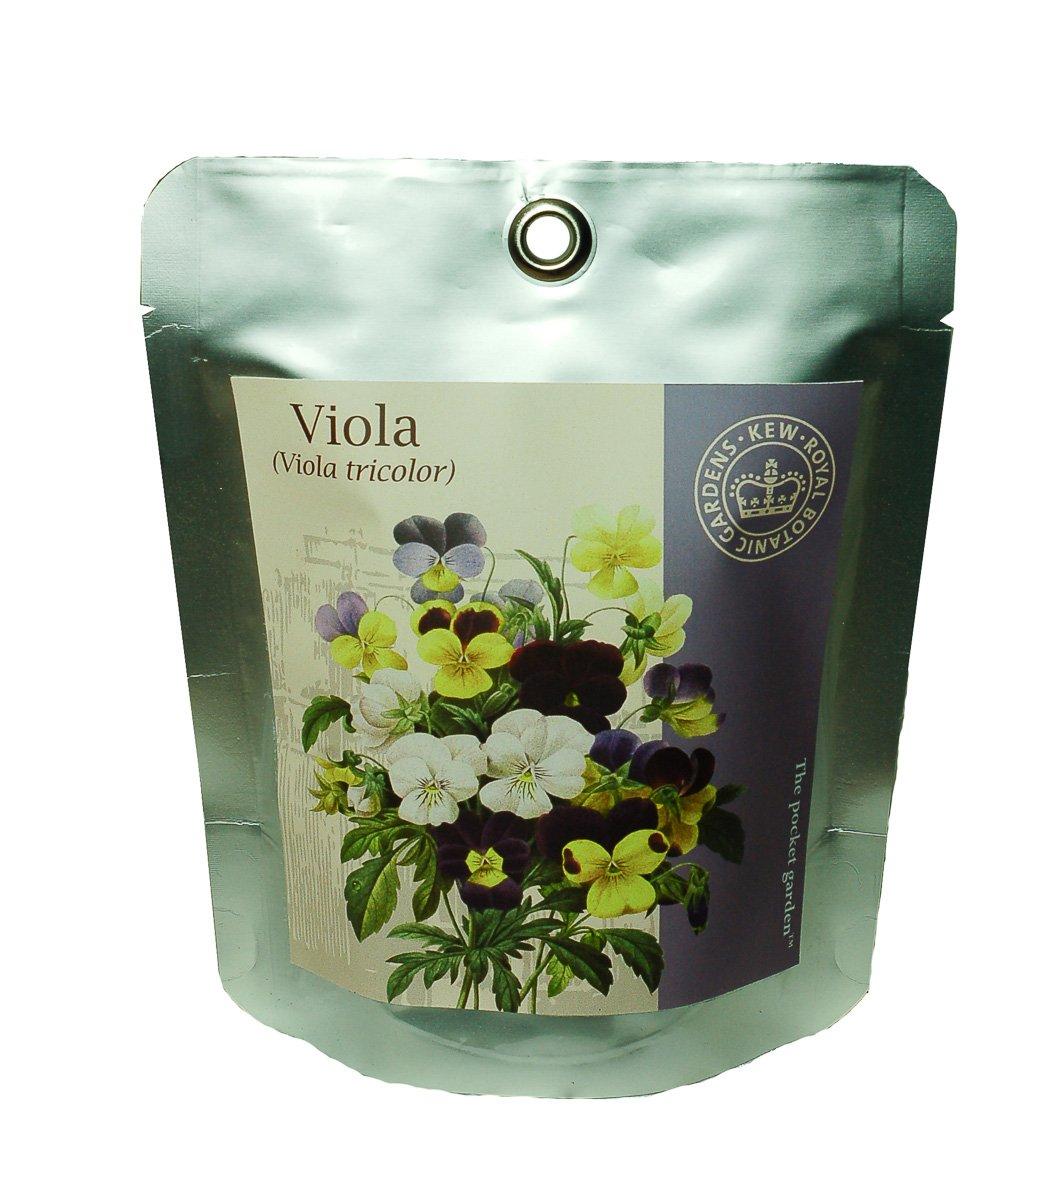 Kew Grow Viola Pocket Gardens Kit Canova Garden KPG9518